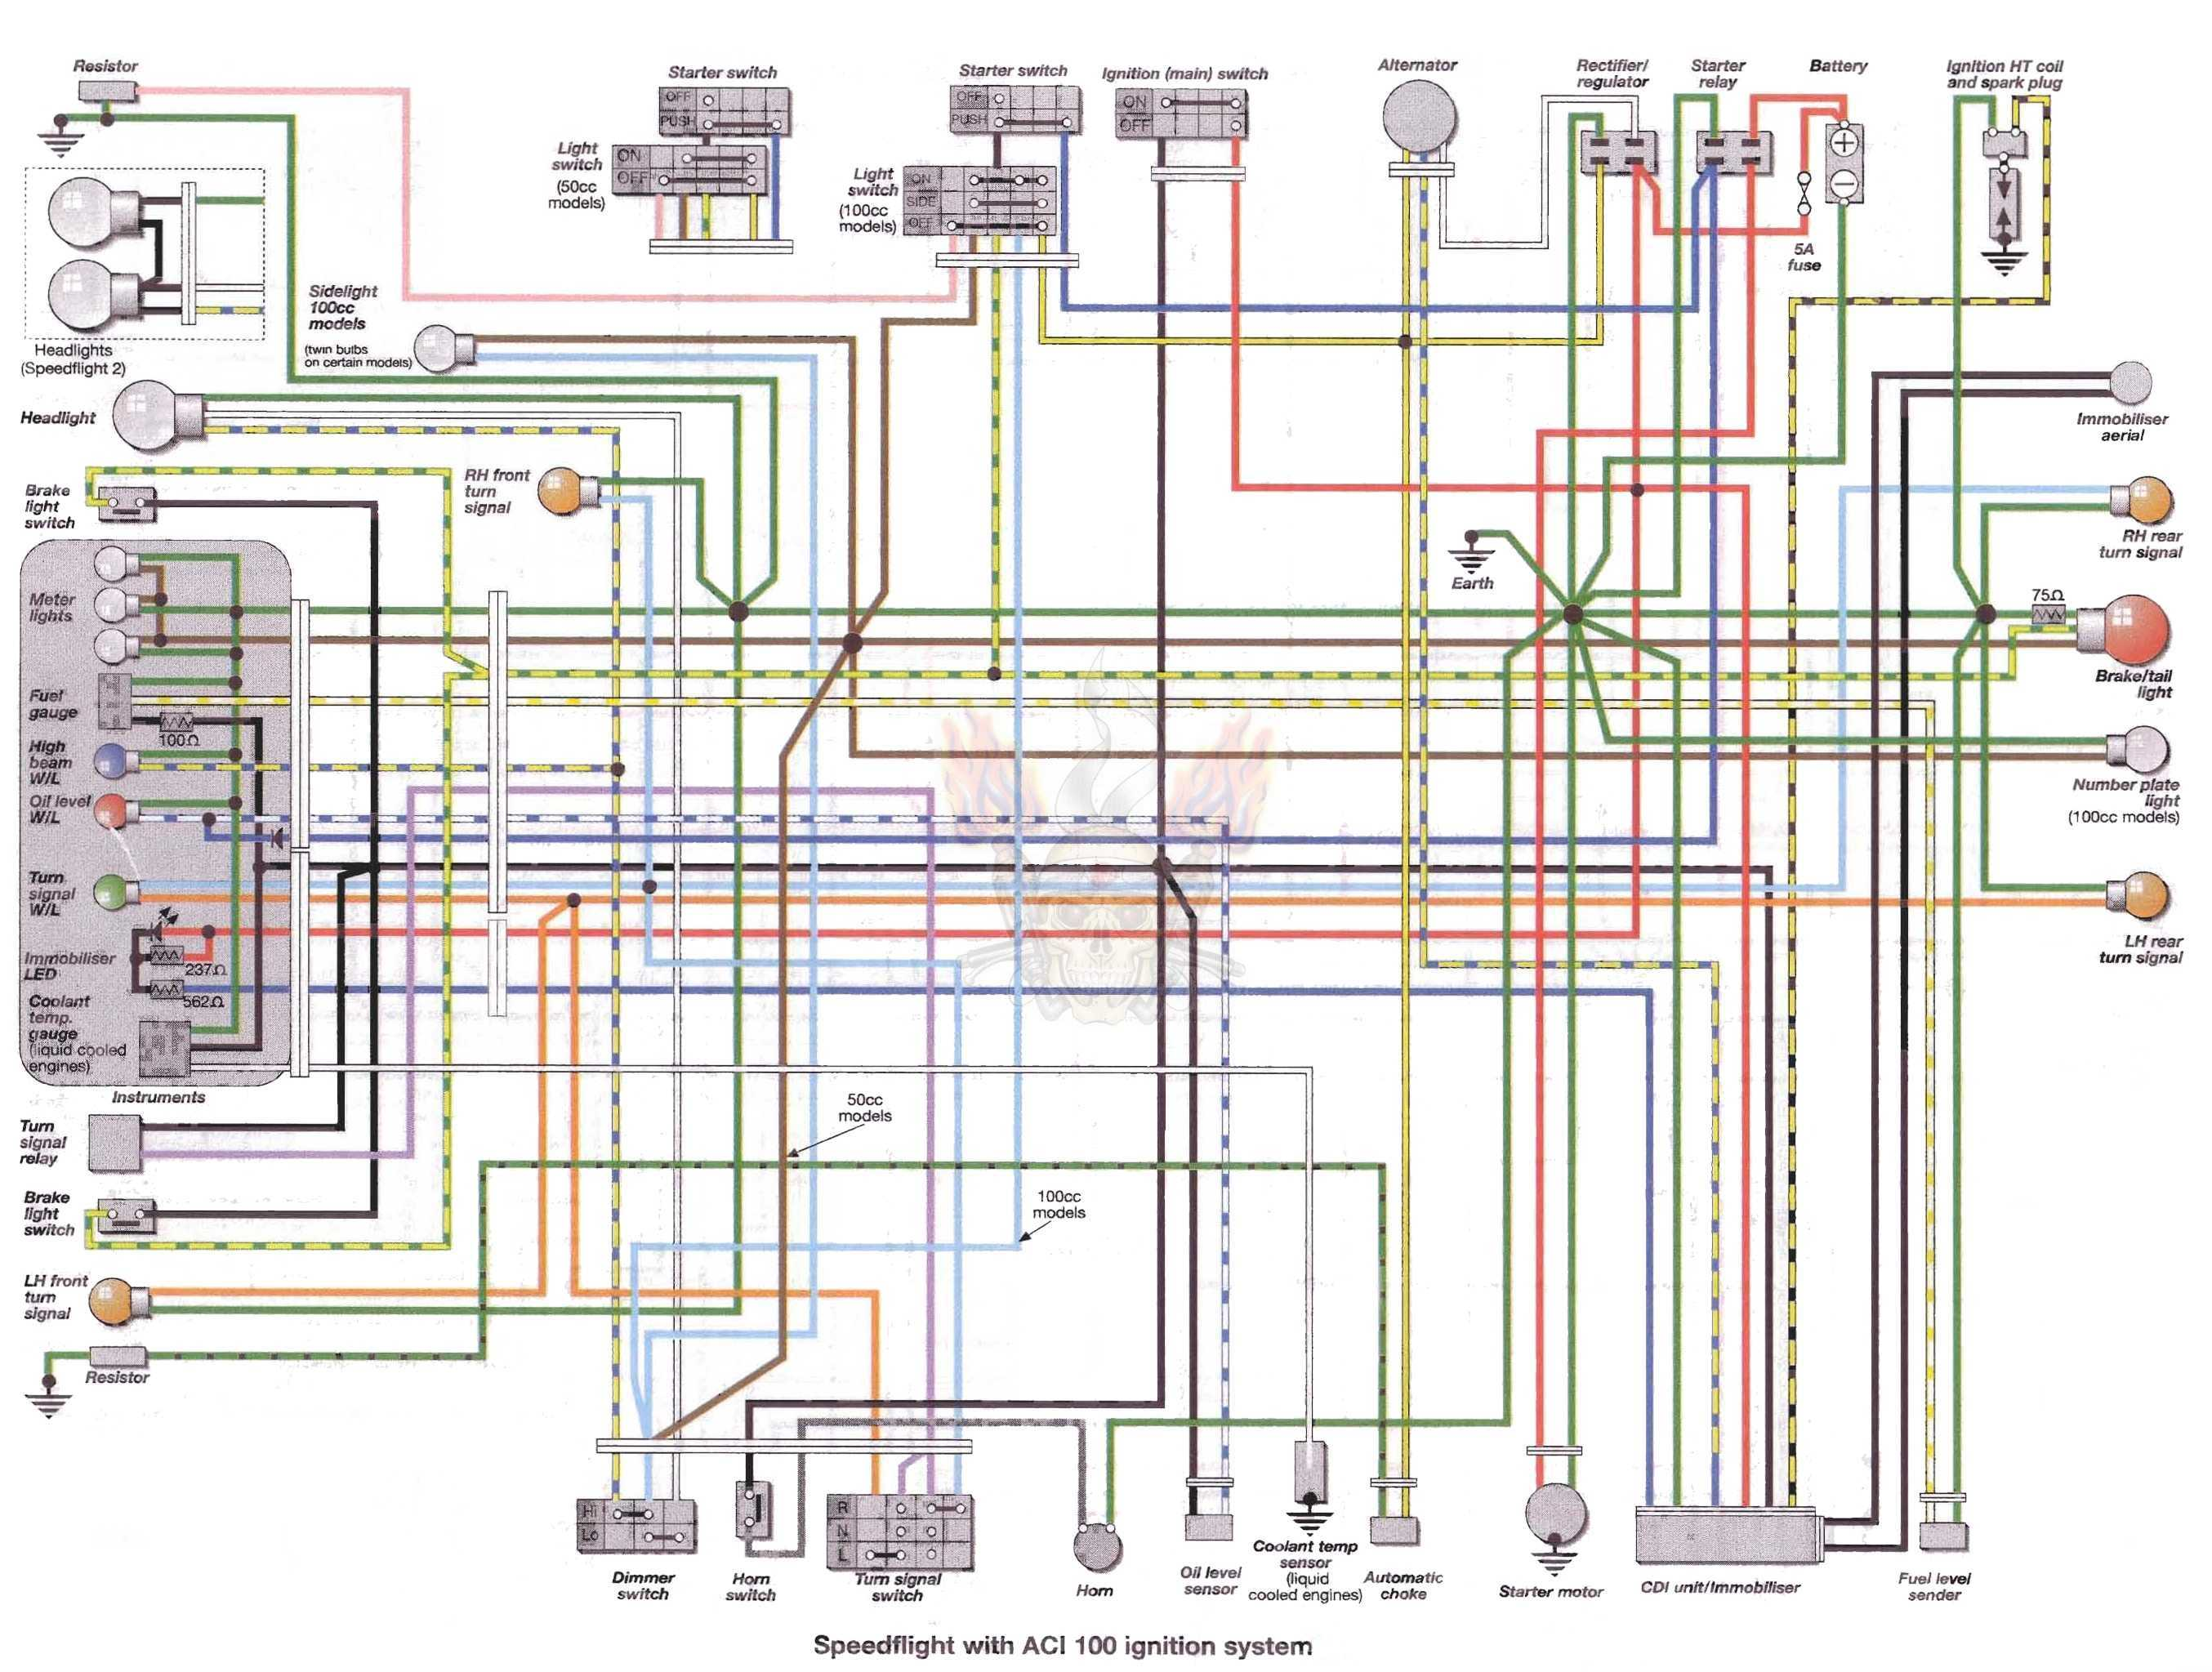 peugeot motorcycle manuals pdf wiring diagrams fault codes rh motorcycle manual com peugeot 103 moped wiring diagram Electric Scooter Wiring Diagrams